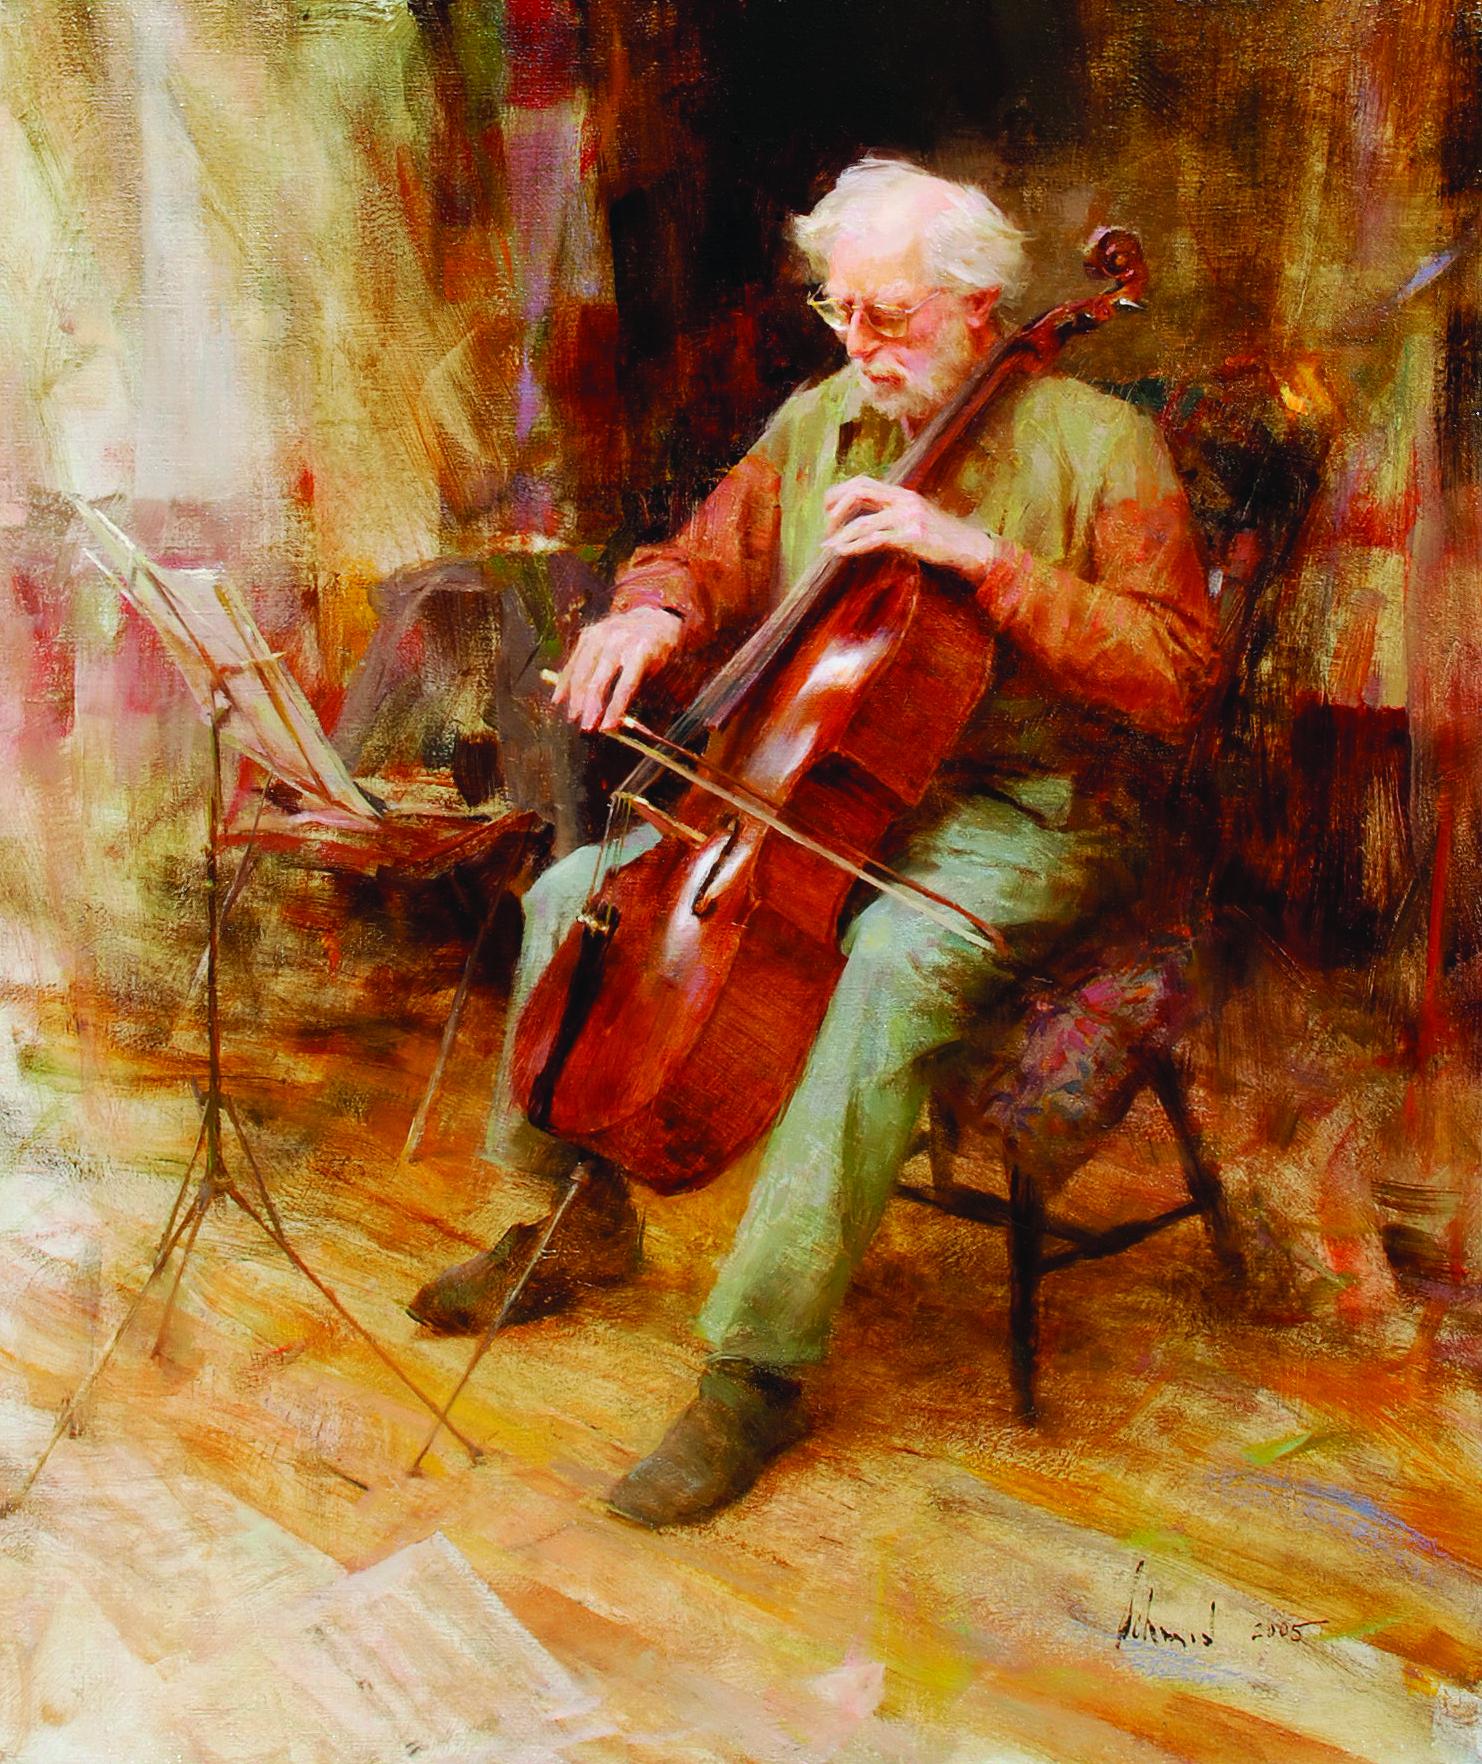 Richard Schmid_David Wells, Cellist_2005_oil on canvas_26 x 22 in._$85,000.jpg